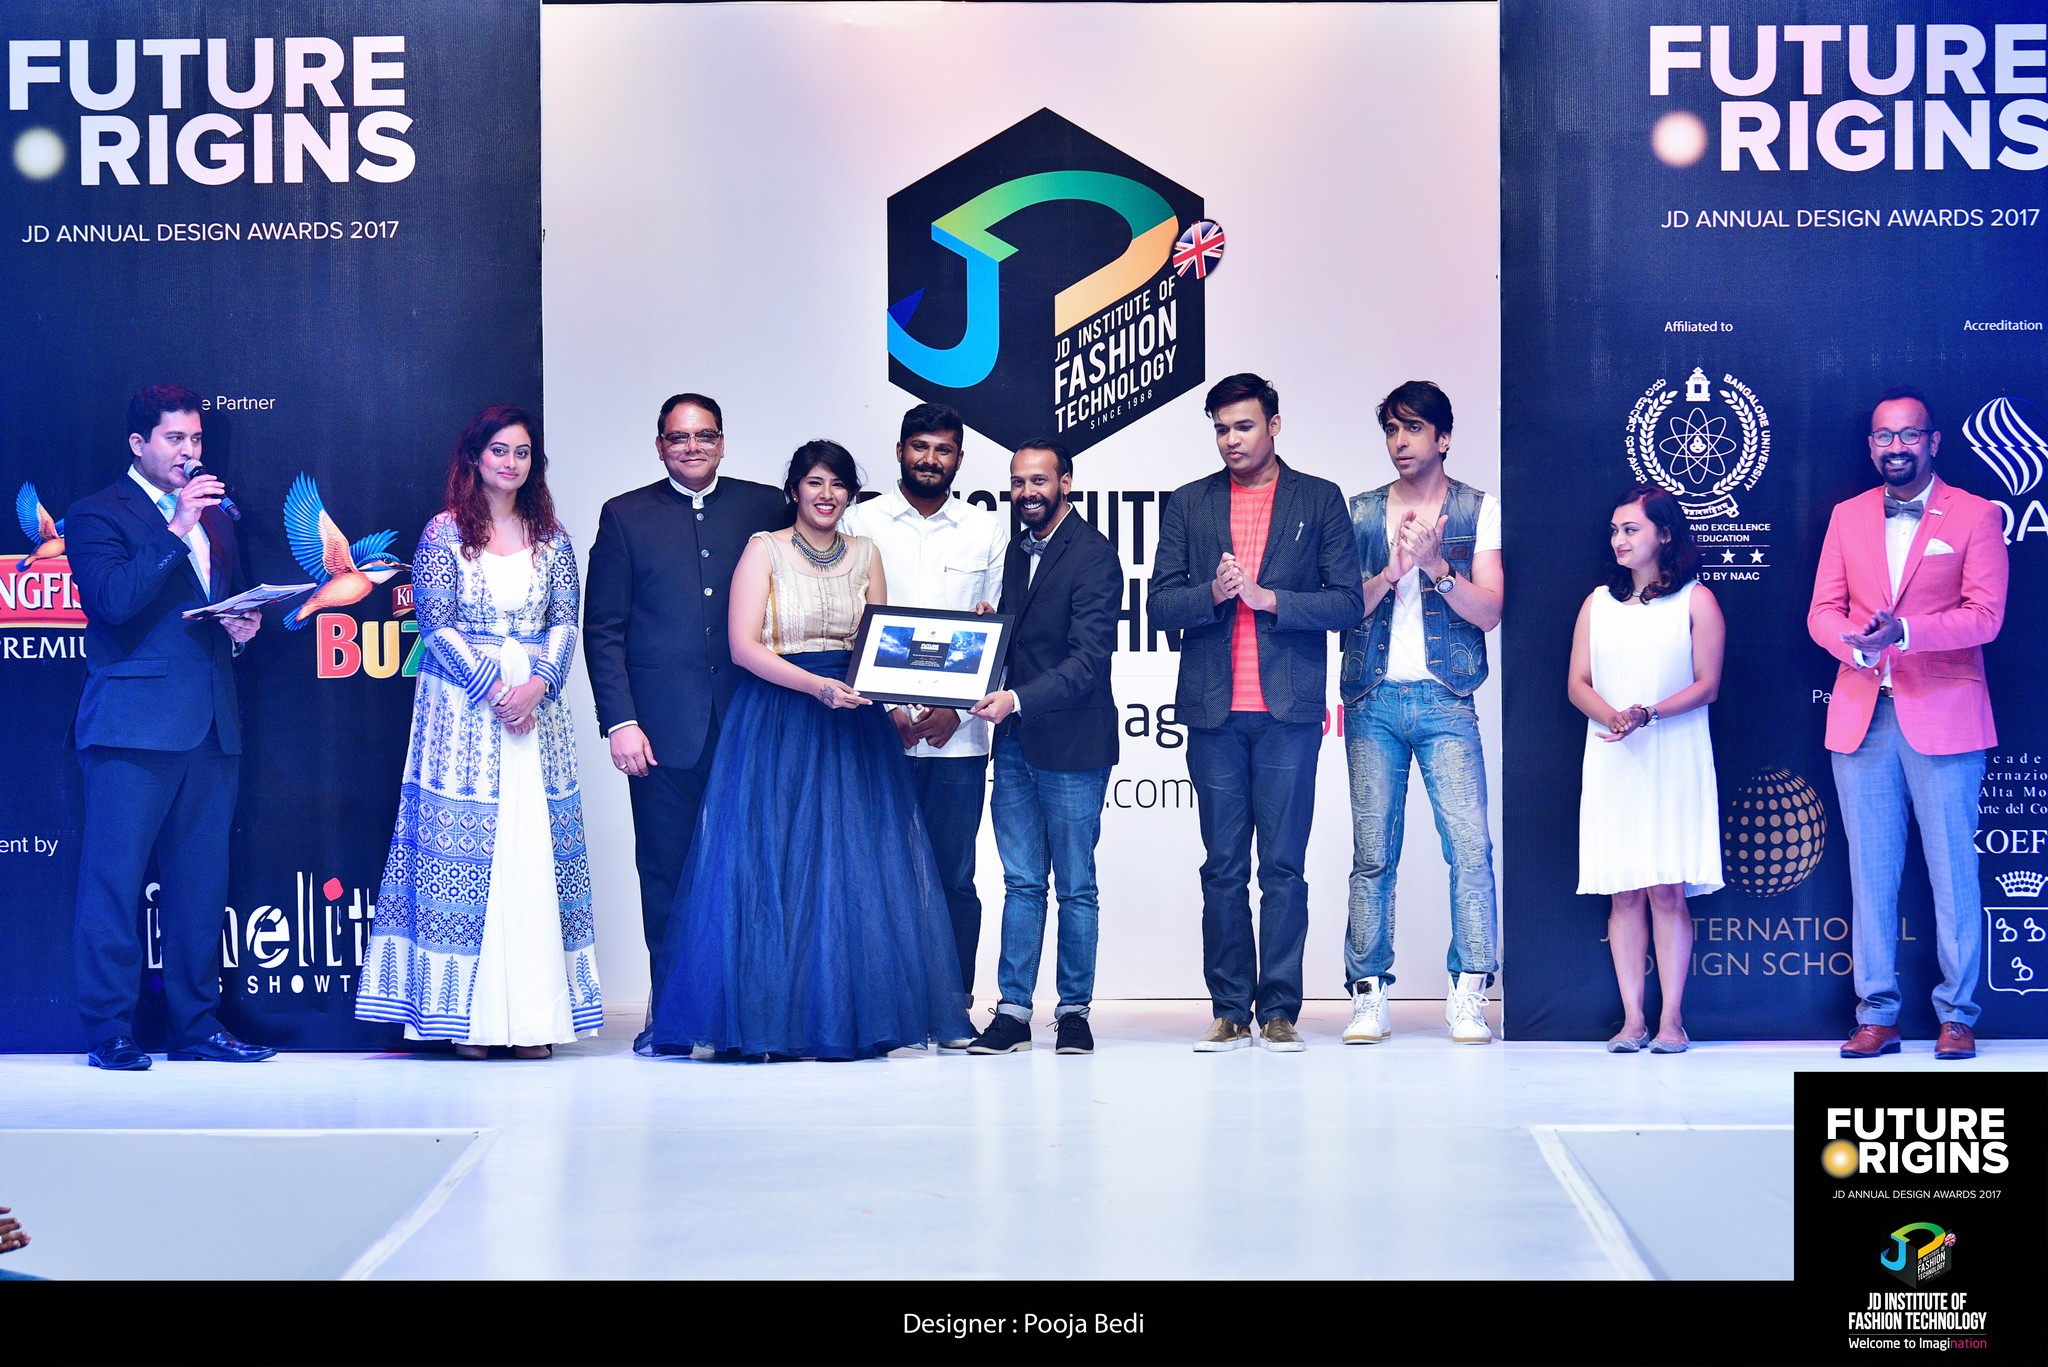 Rustic WabiSabi - Future Origin - JD Annual Design Awards 2017   Photography : Jerin Nath rustic wabisabi - Rustic WabiSabi Future Origin JD Annual Design Awards 2017 12 - Rustic WabiSabi – Future Origin – JD Annual Design Awards 2017